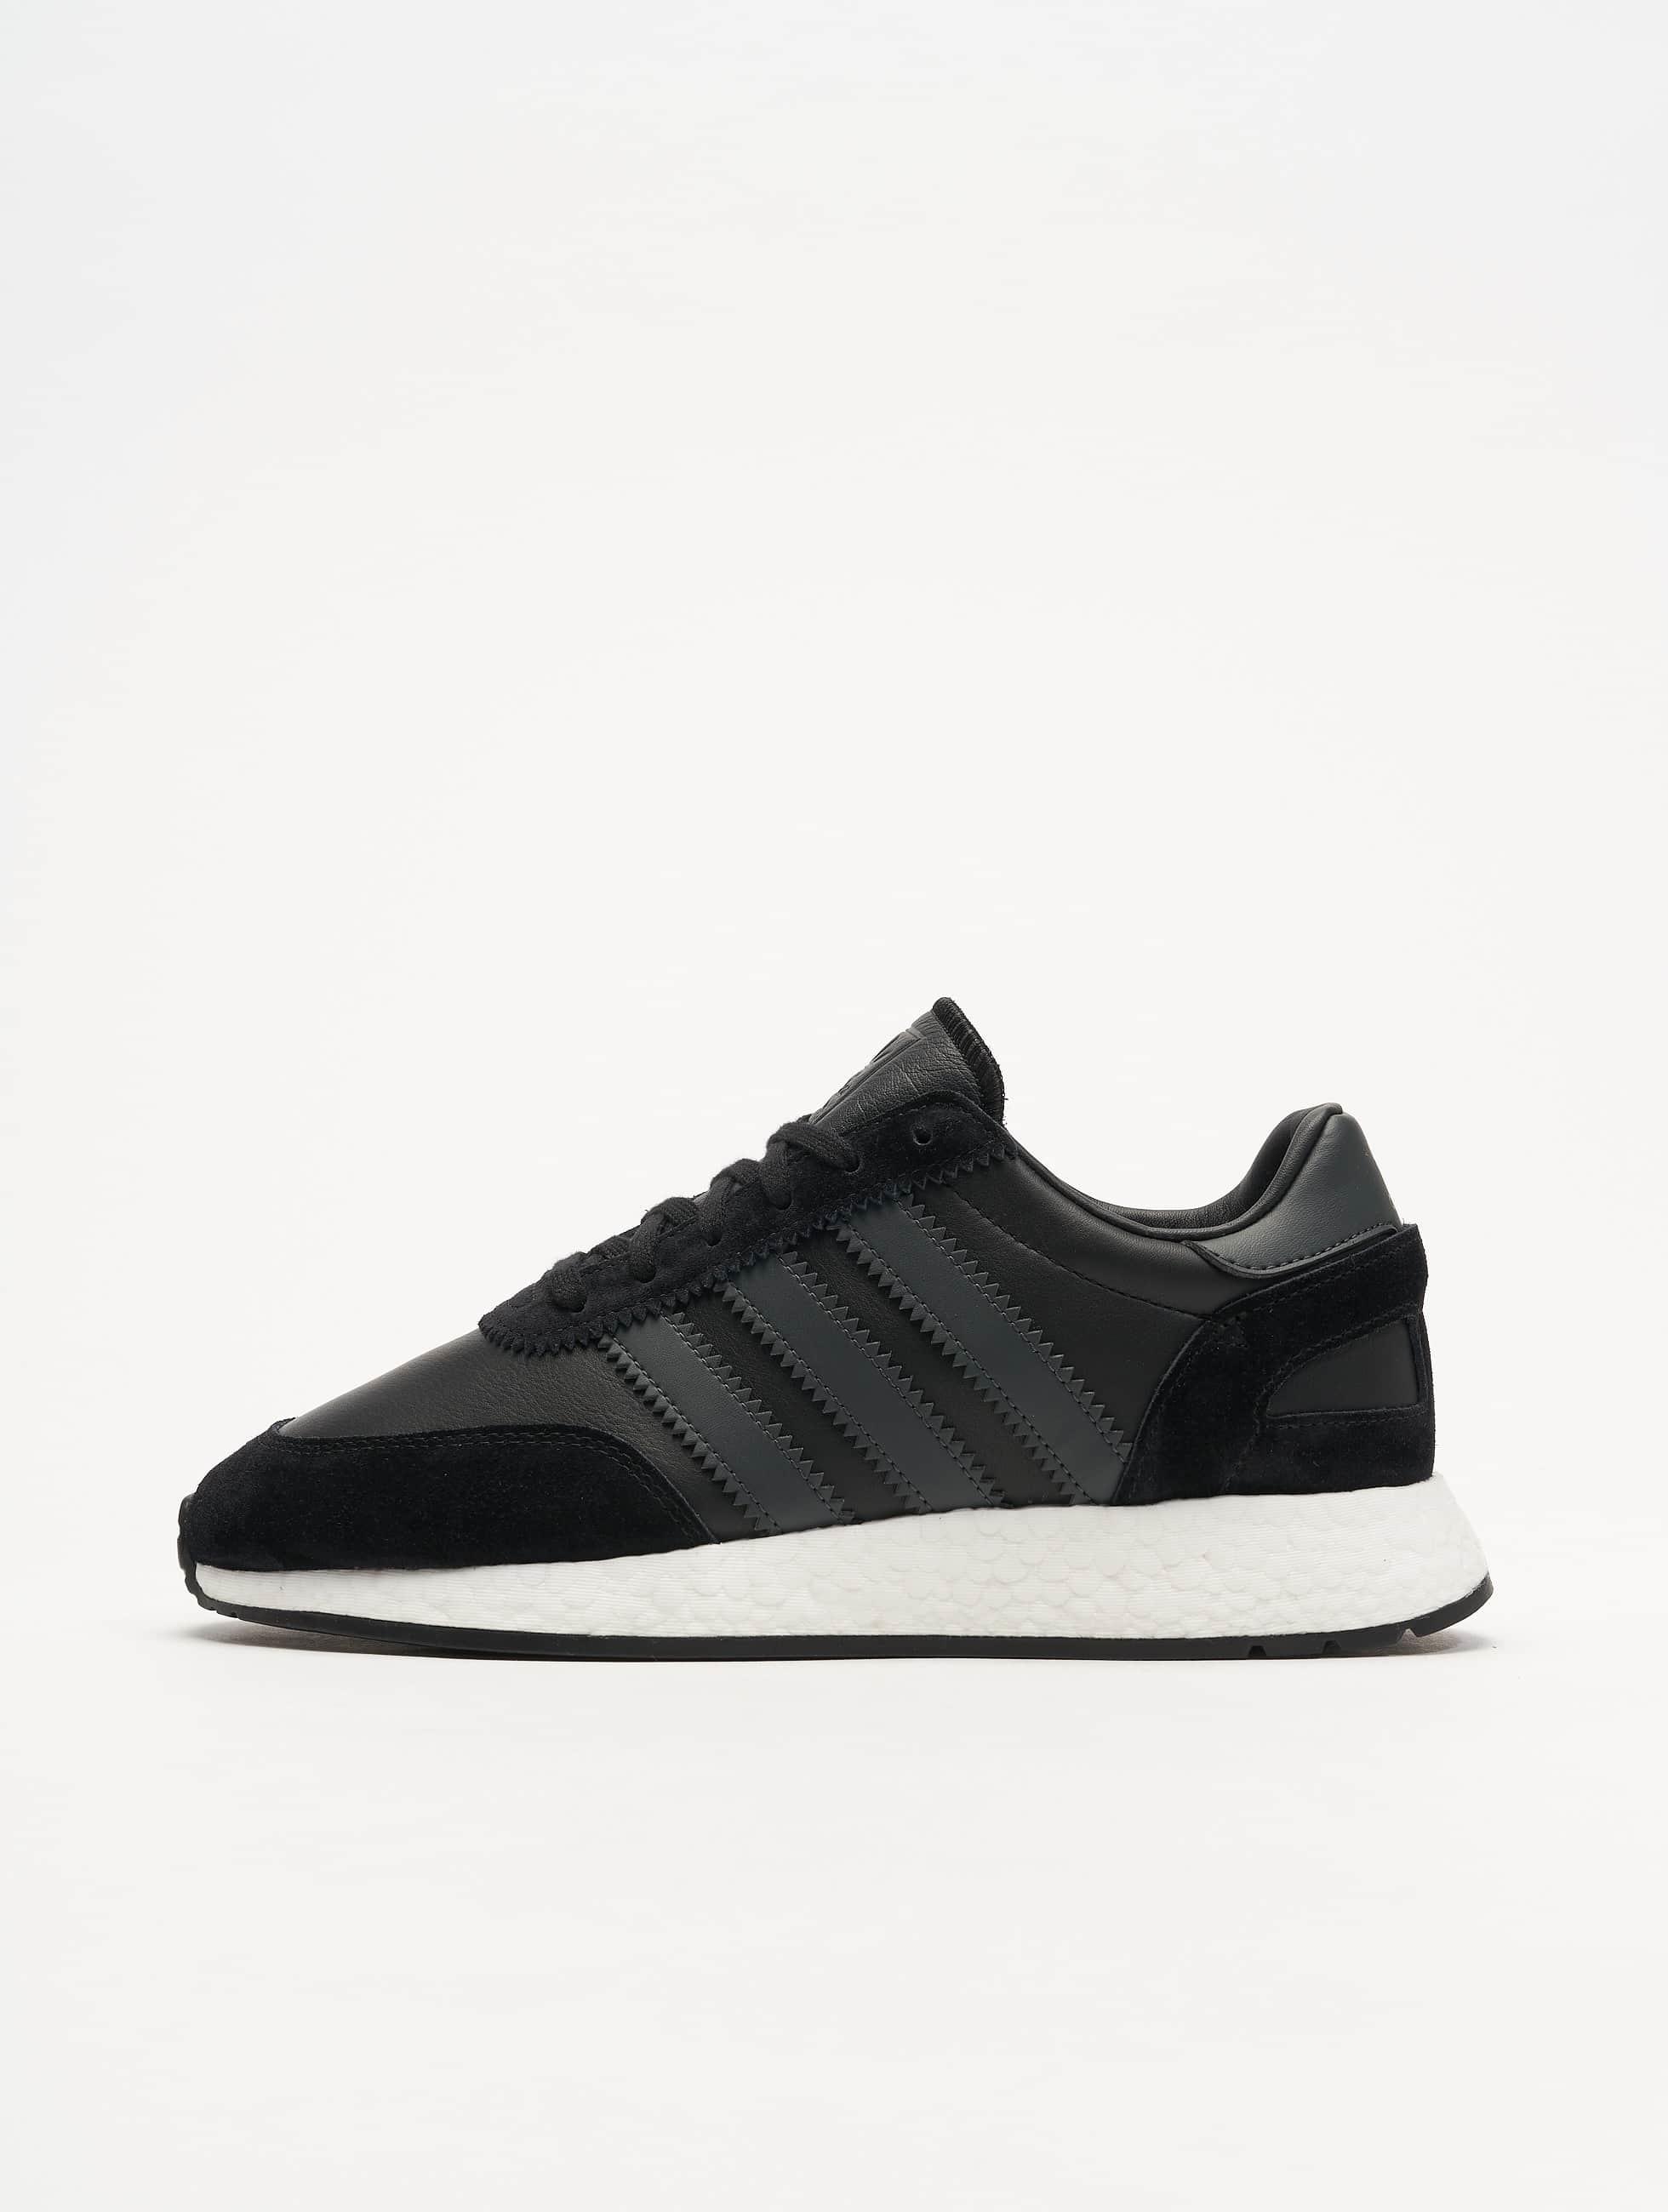 c71038736d8b64 adidas originals | I-5923 noir Homme Baskets 543383